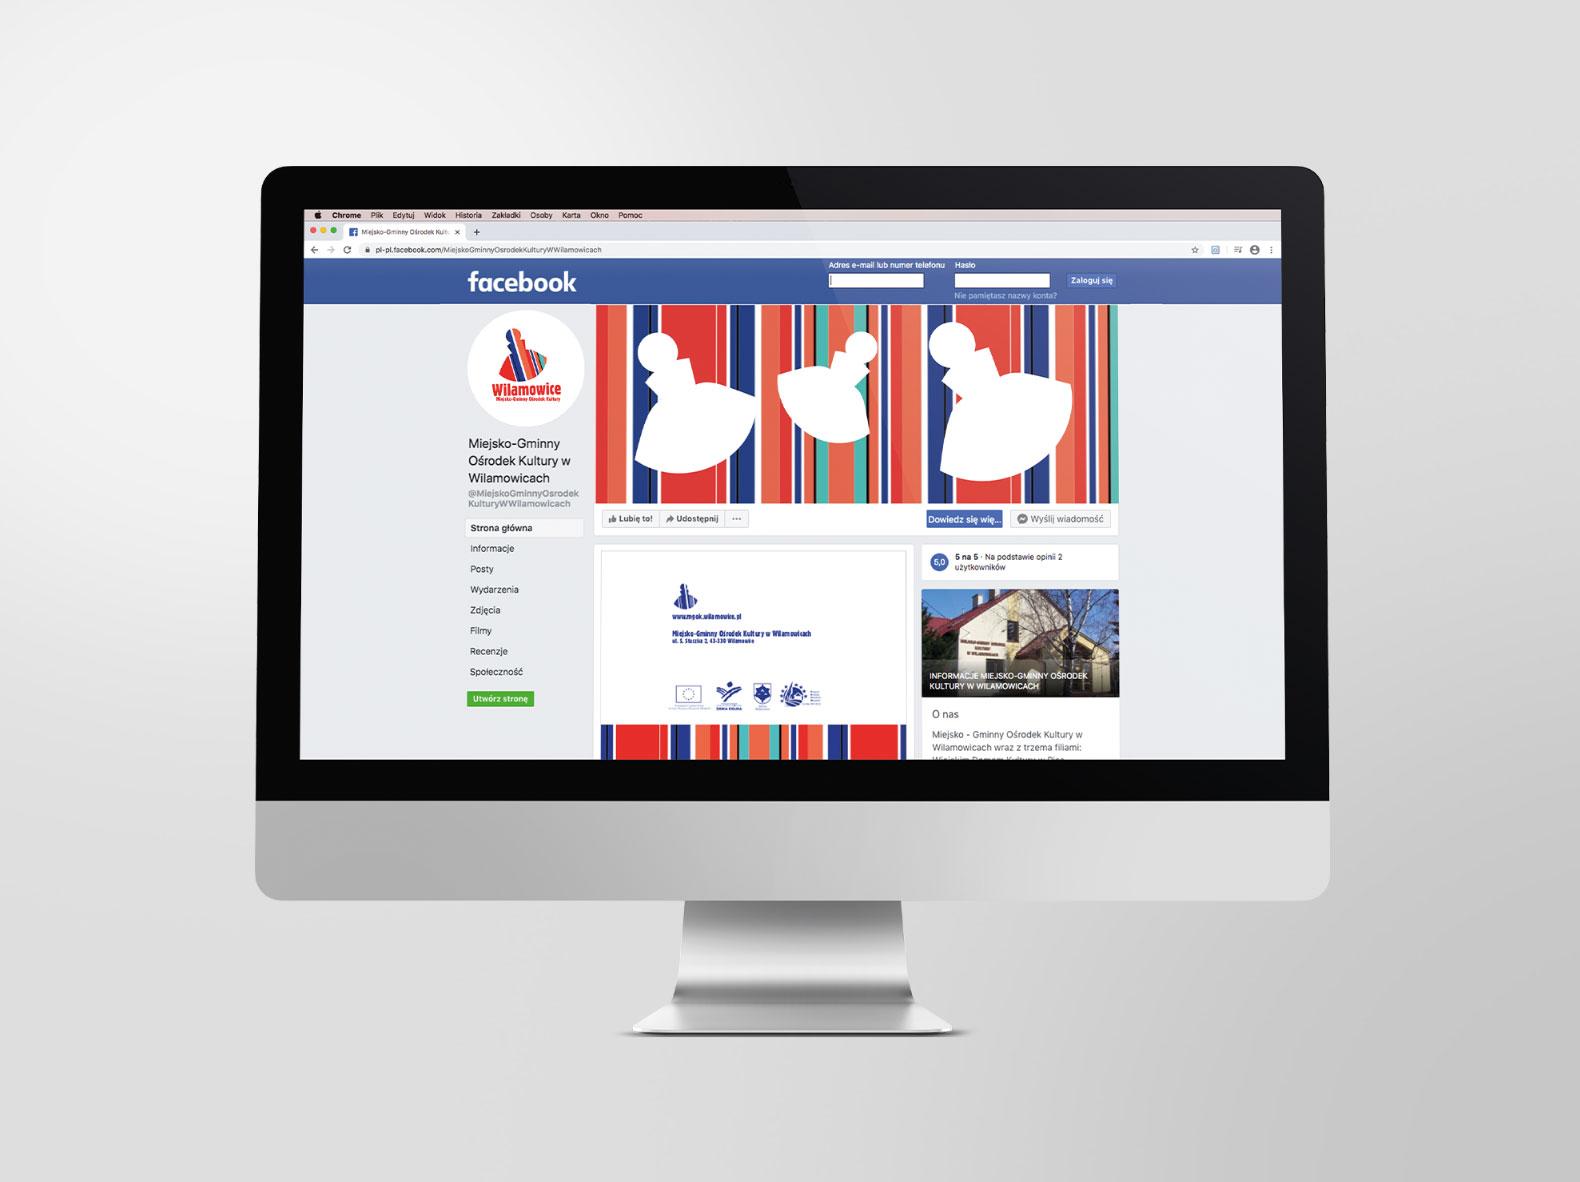 Facebook marketing treści – ikonografika